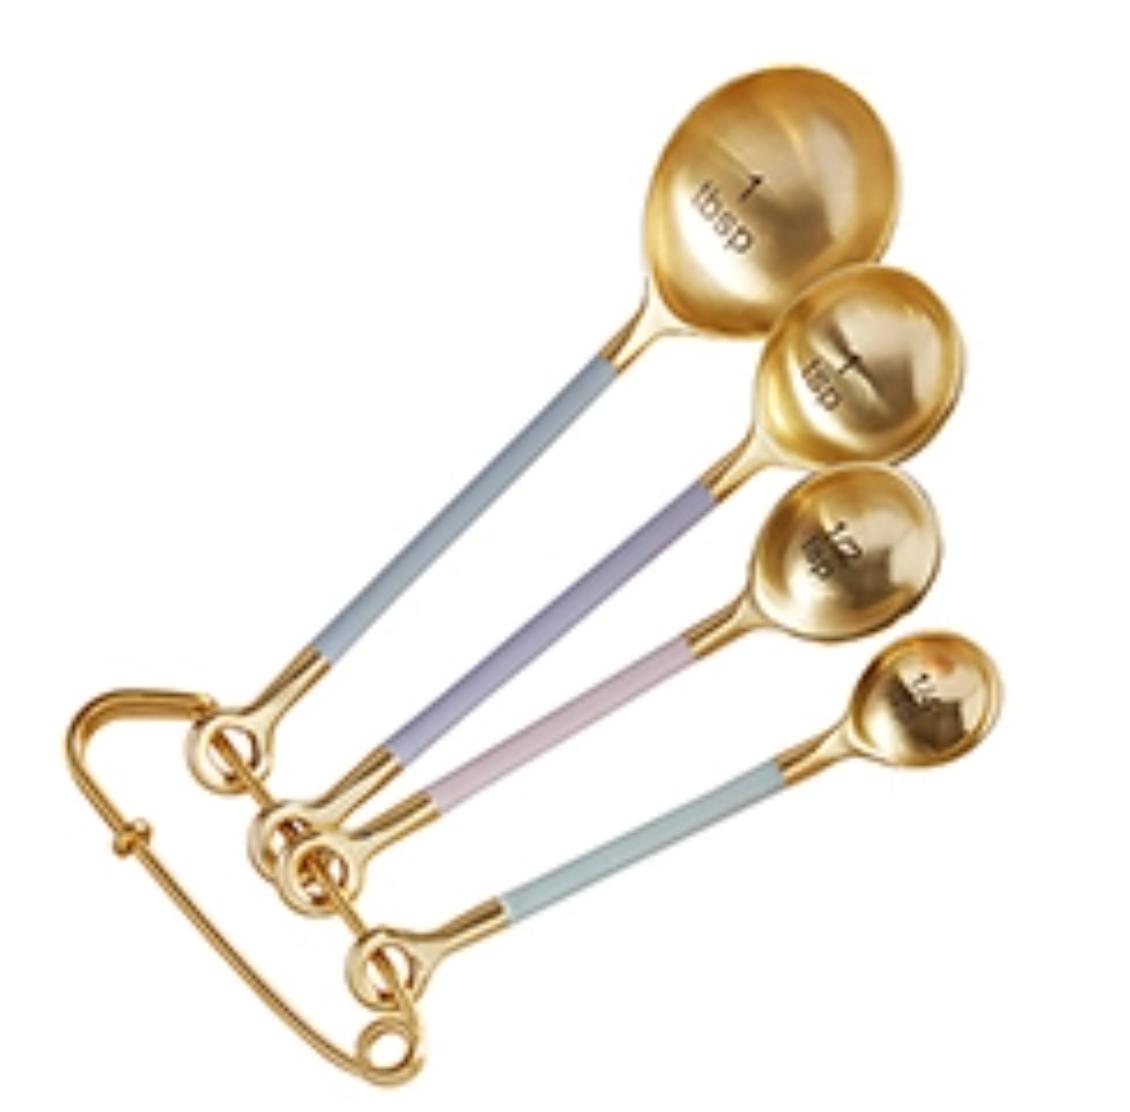 Measuring spoon matte gold